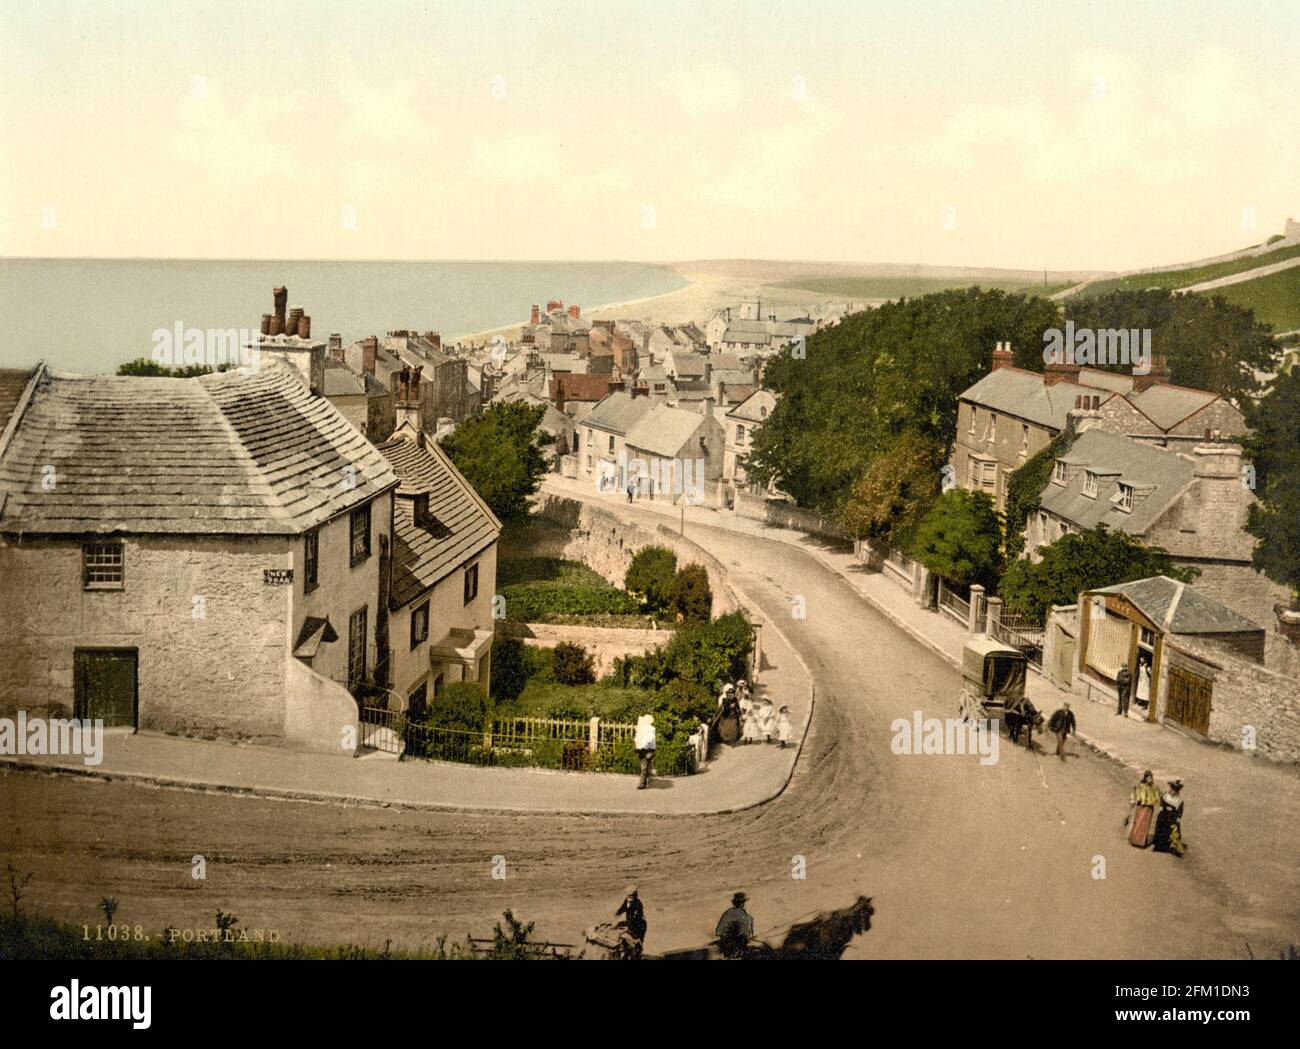 Portland à Dorset vers 1890-1900 Banque D'Images